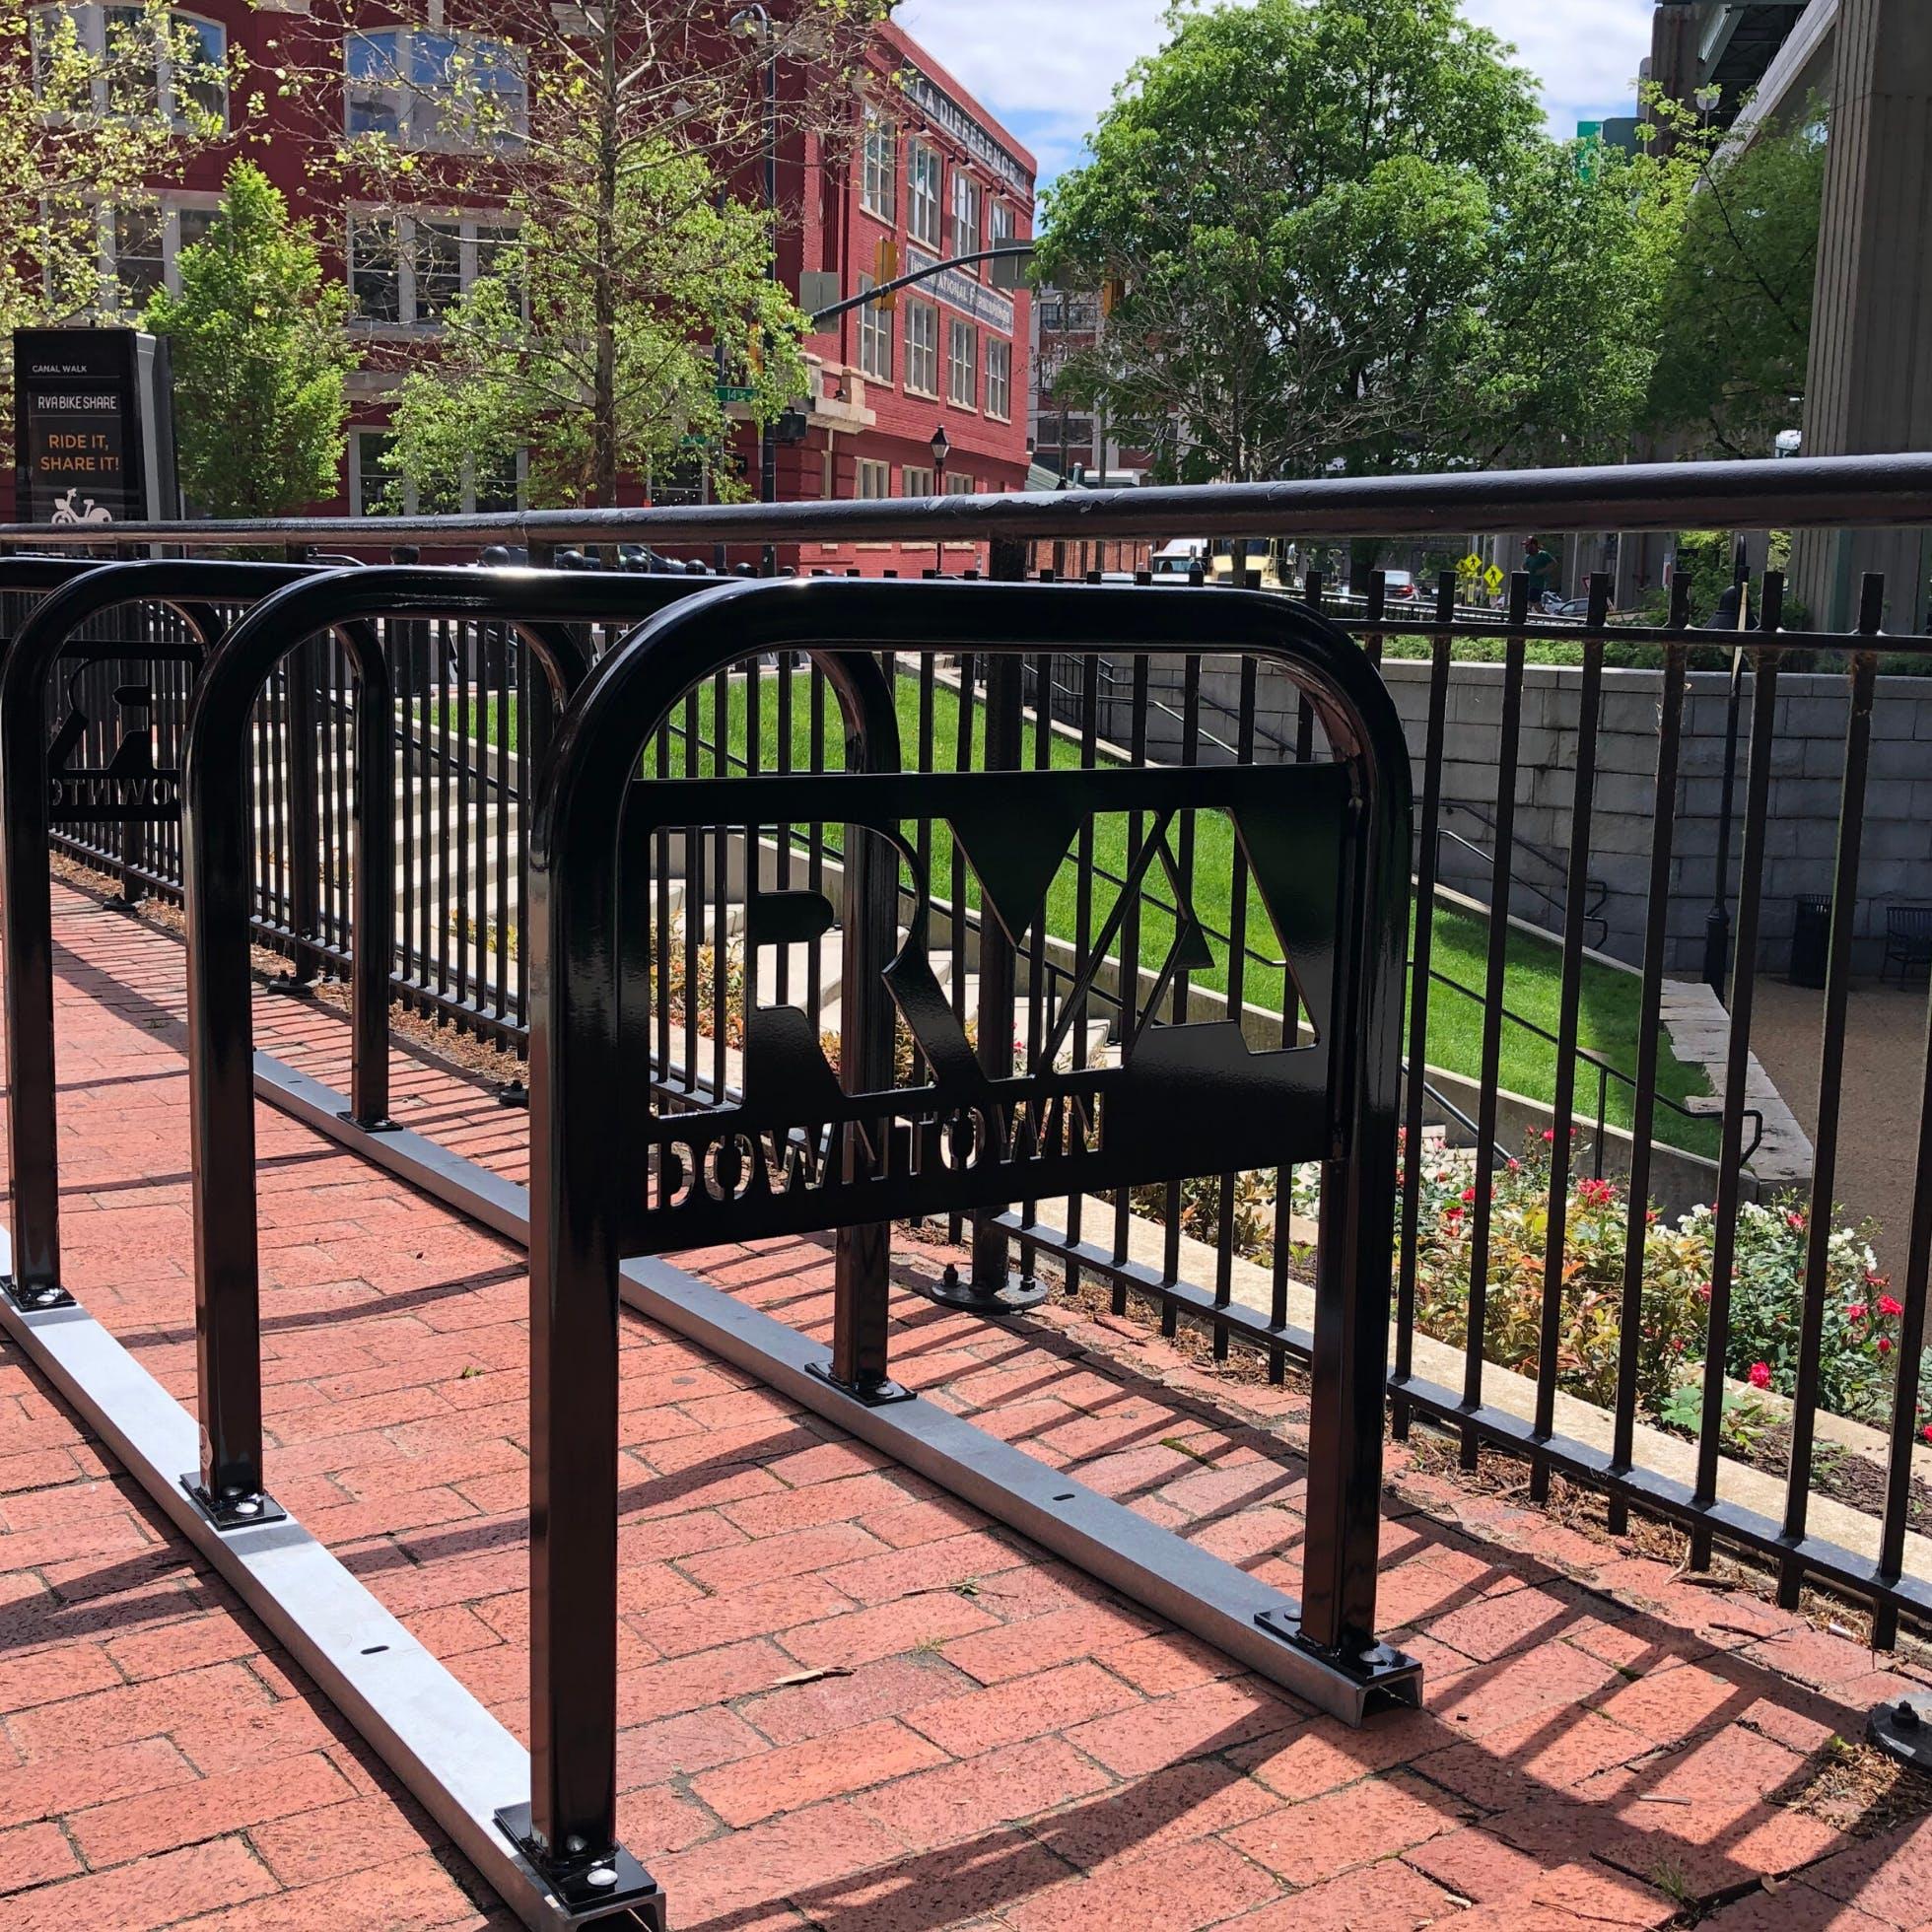 Downtown Richmond Bike Racks at Turning Basin